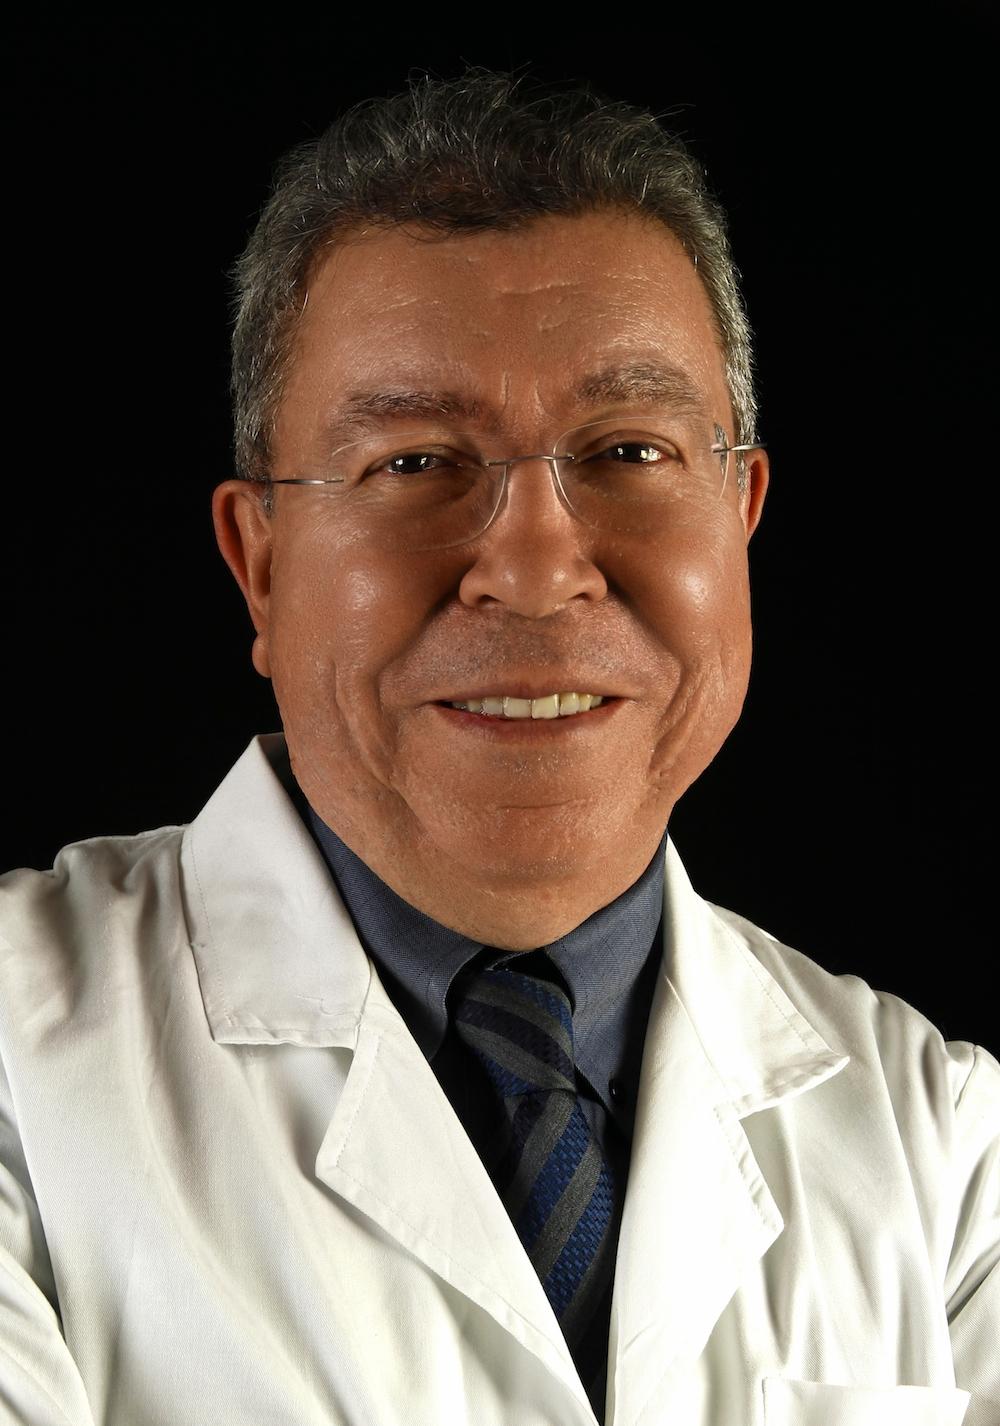 Dottor Claudio Comacchi